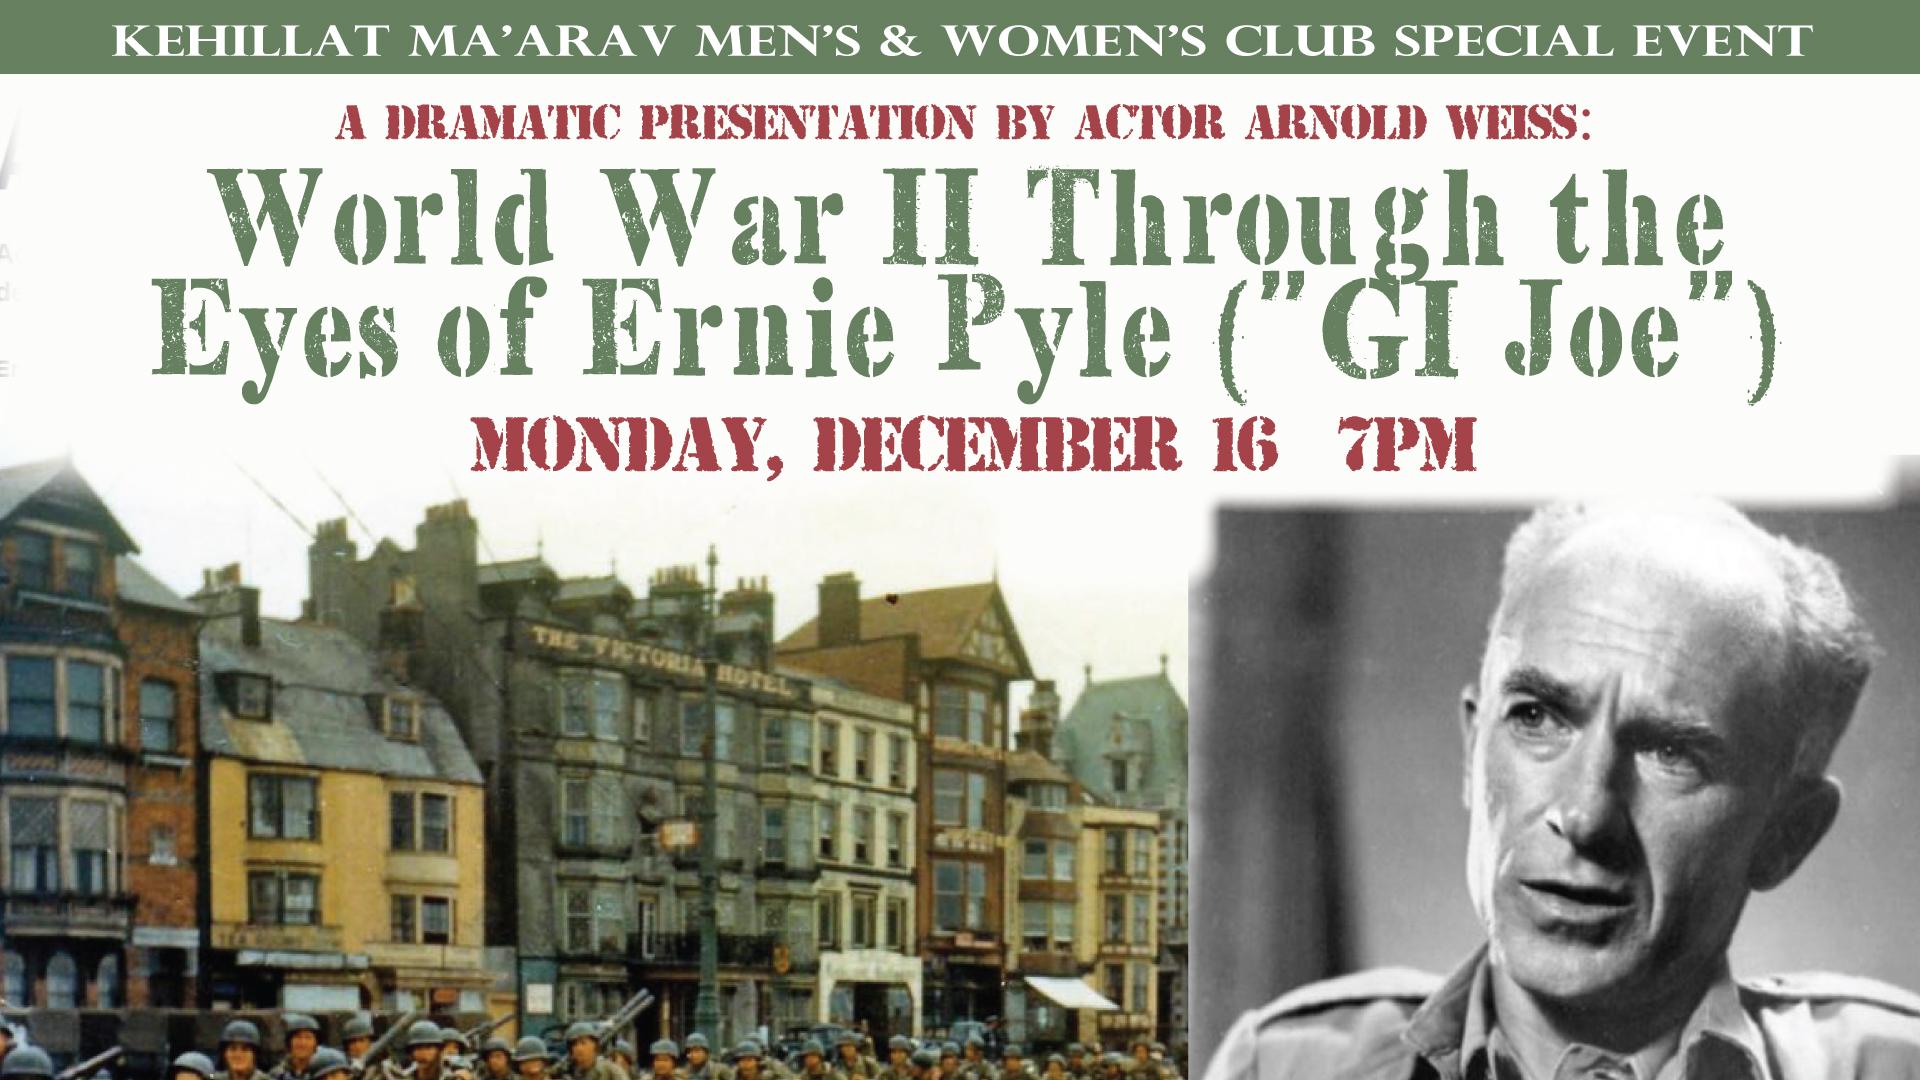 WWII Through the Eyes of Ernie Pyle